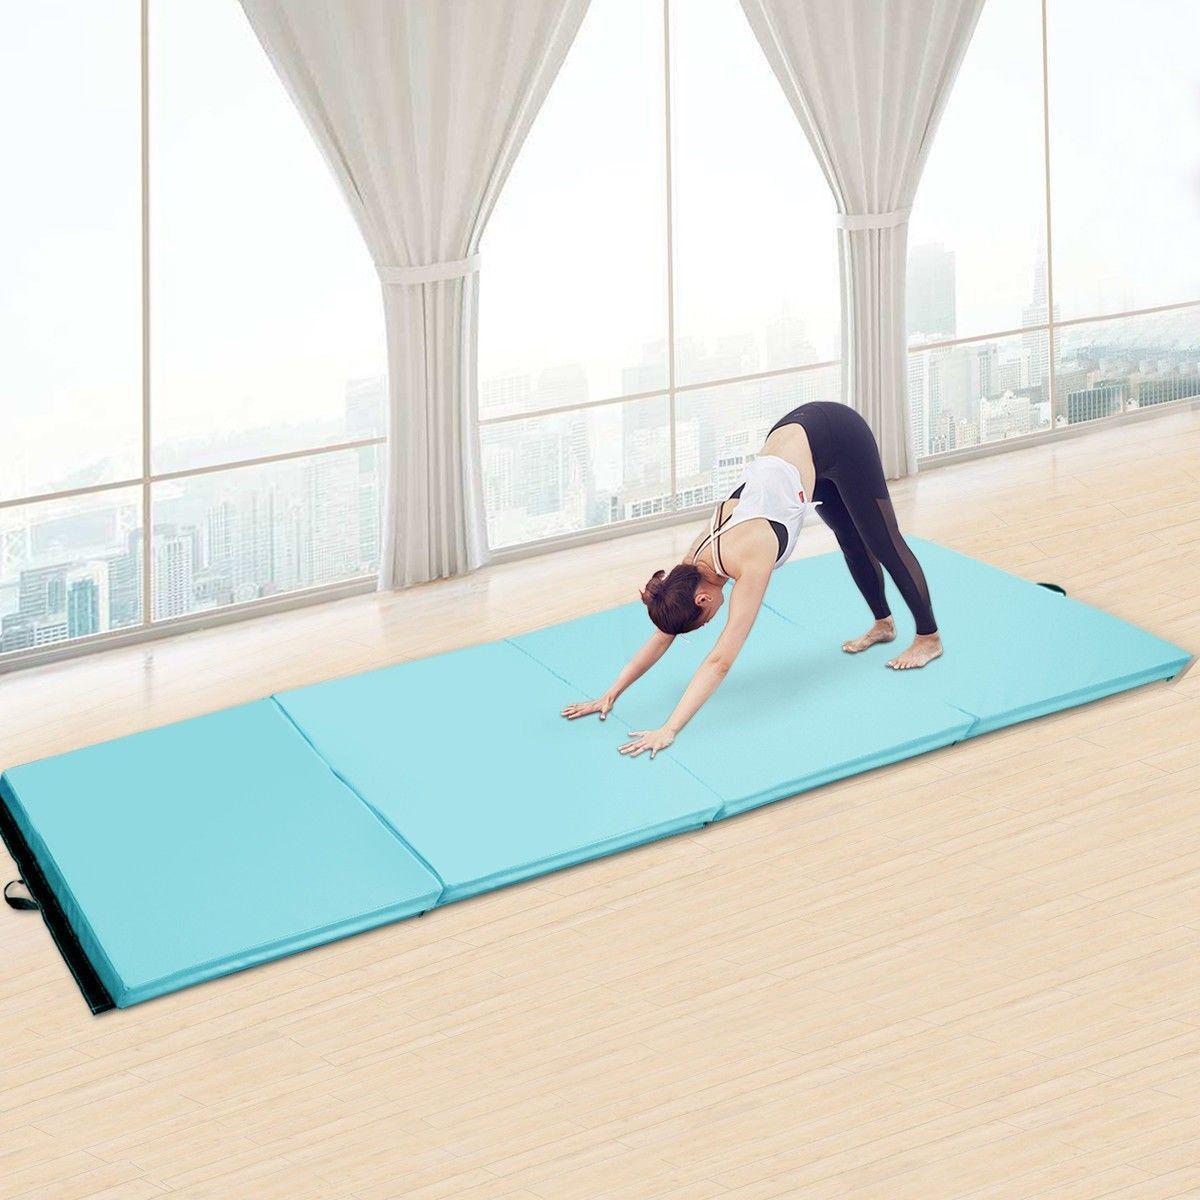 4 X 10 X 2 Thick Folding Panel Aerobics Exercise Gymnastics Mat Gymnastics Mats Aerobics Gymnastics Gym